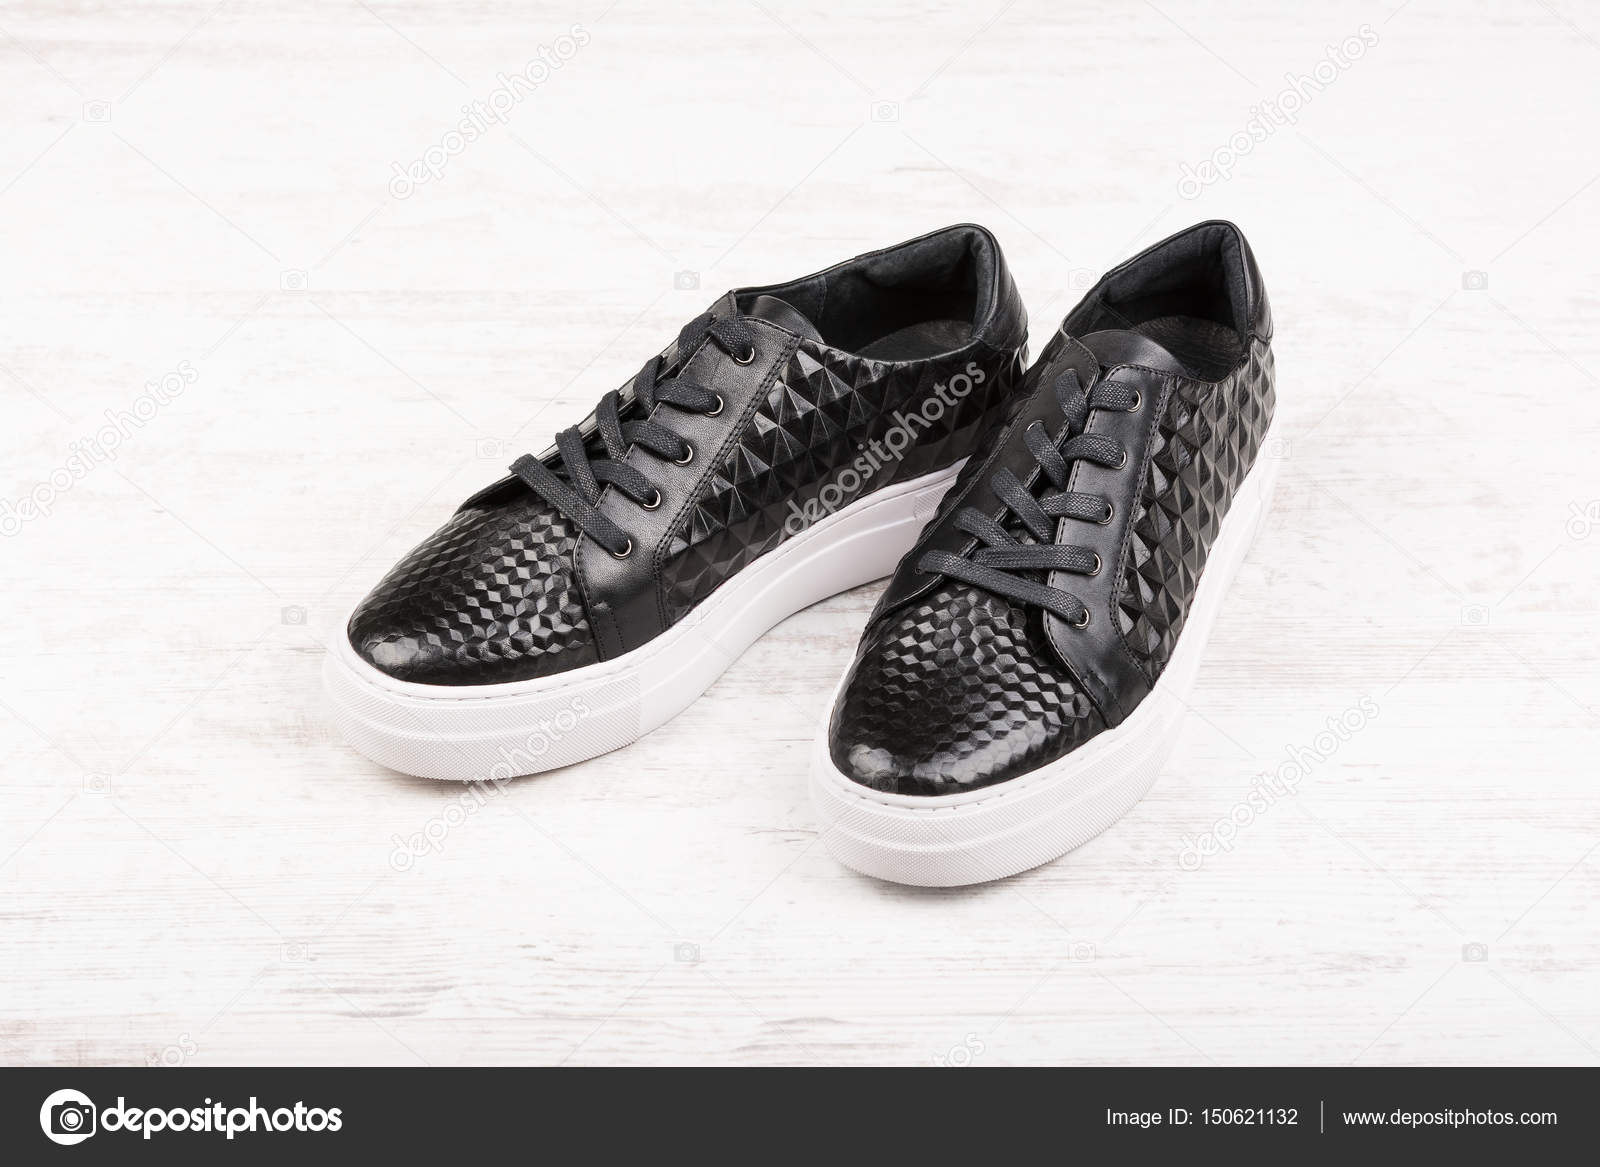 1a068a717be Ζευγάρι μαύρα γυναικείο δερμάτινα αθλητικά παπούτσια σε άσπρο φόντο ...